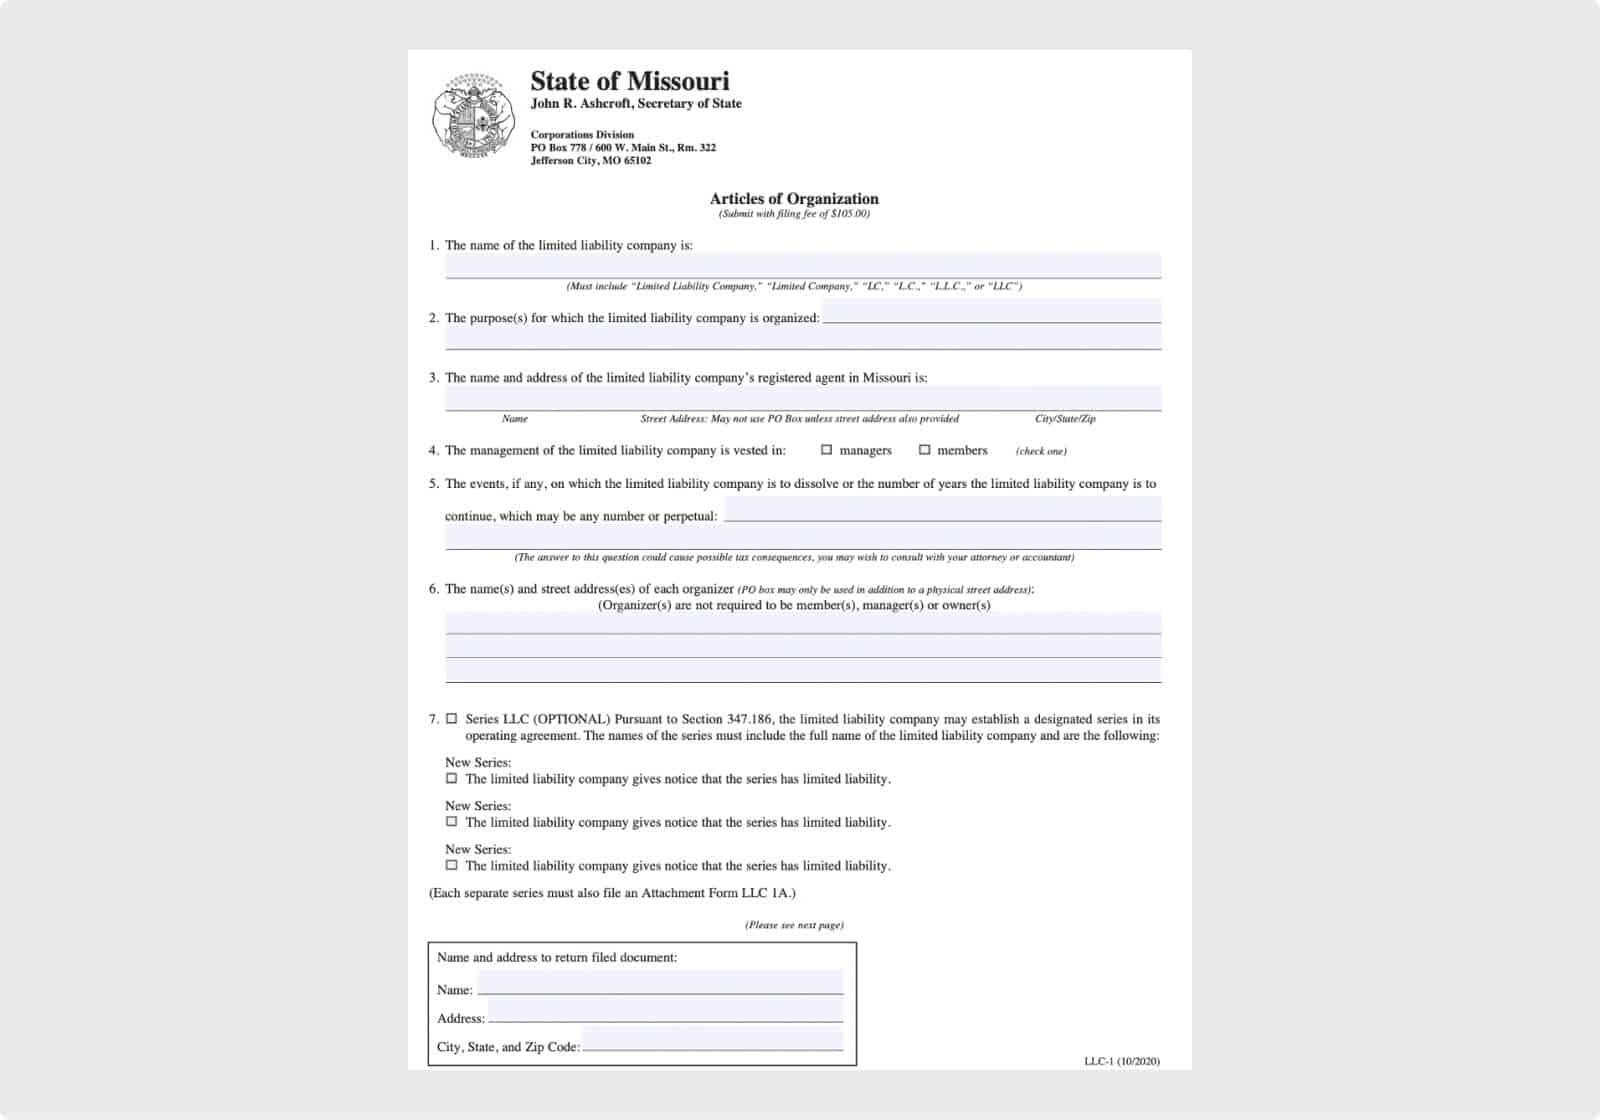 Missouri Articles of Organization (page 1)